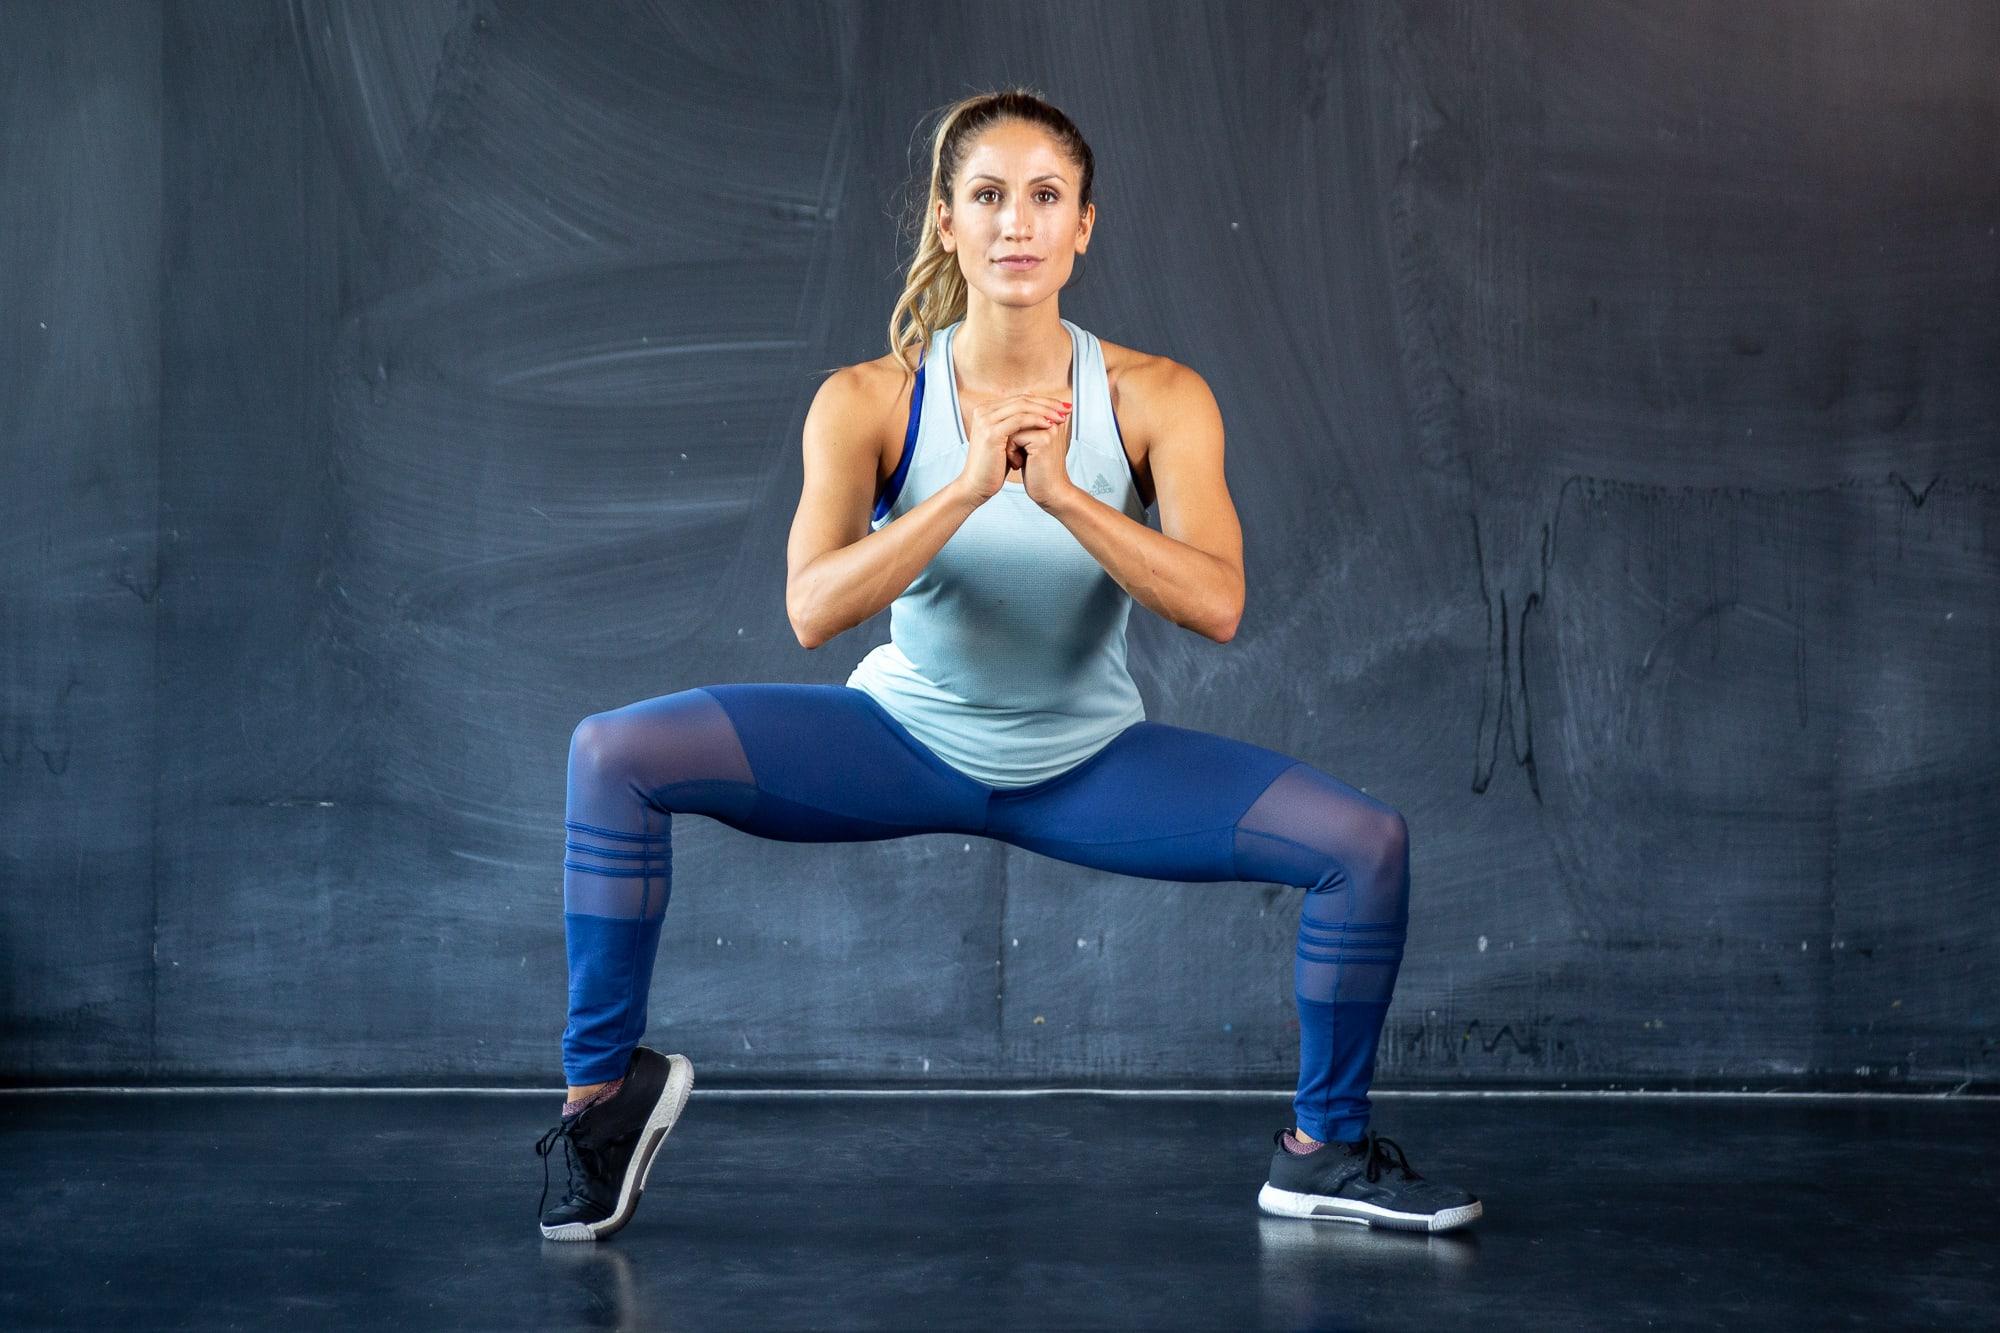 knees click when doing squats